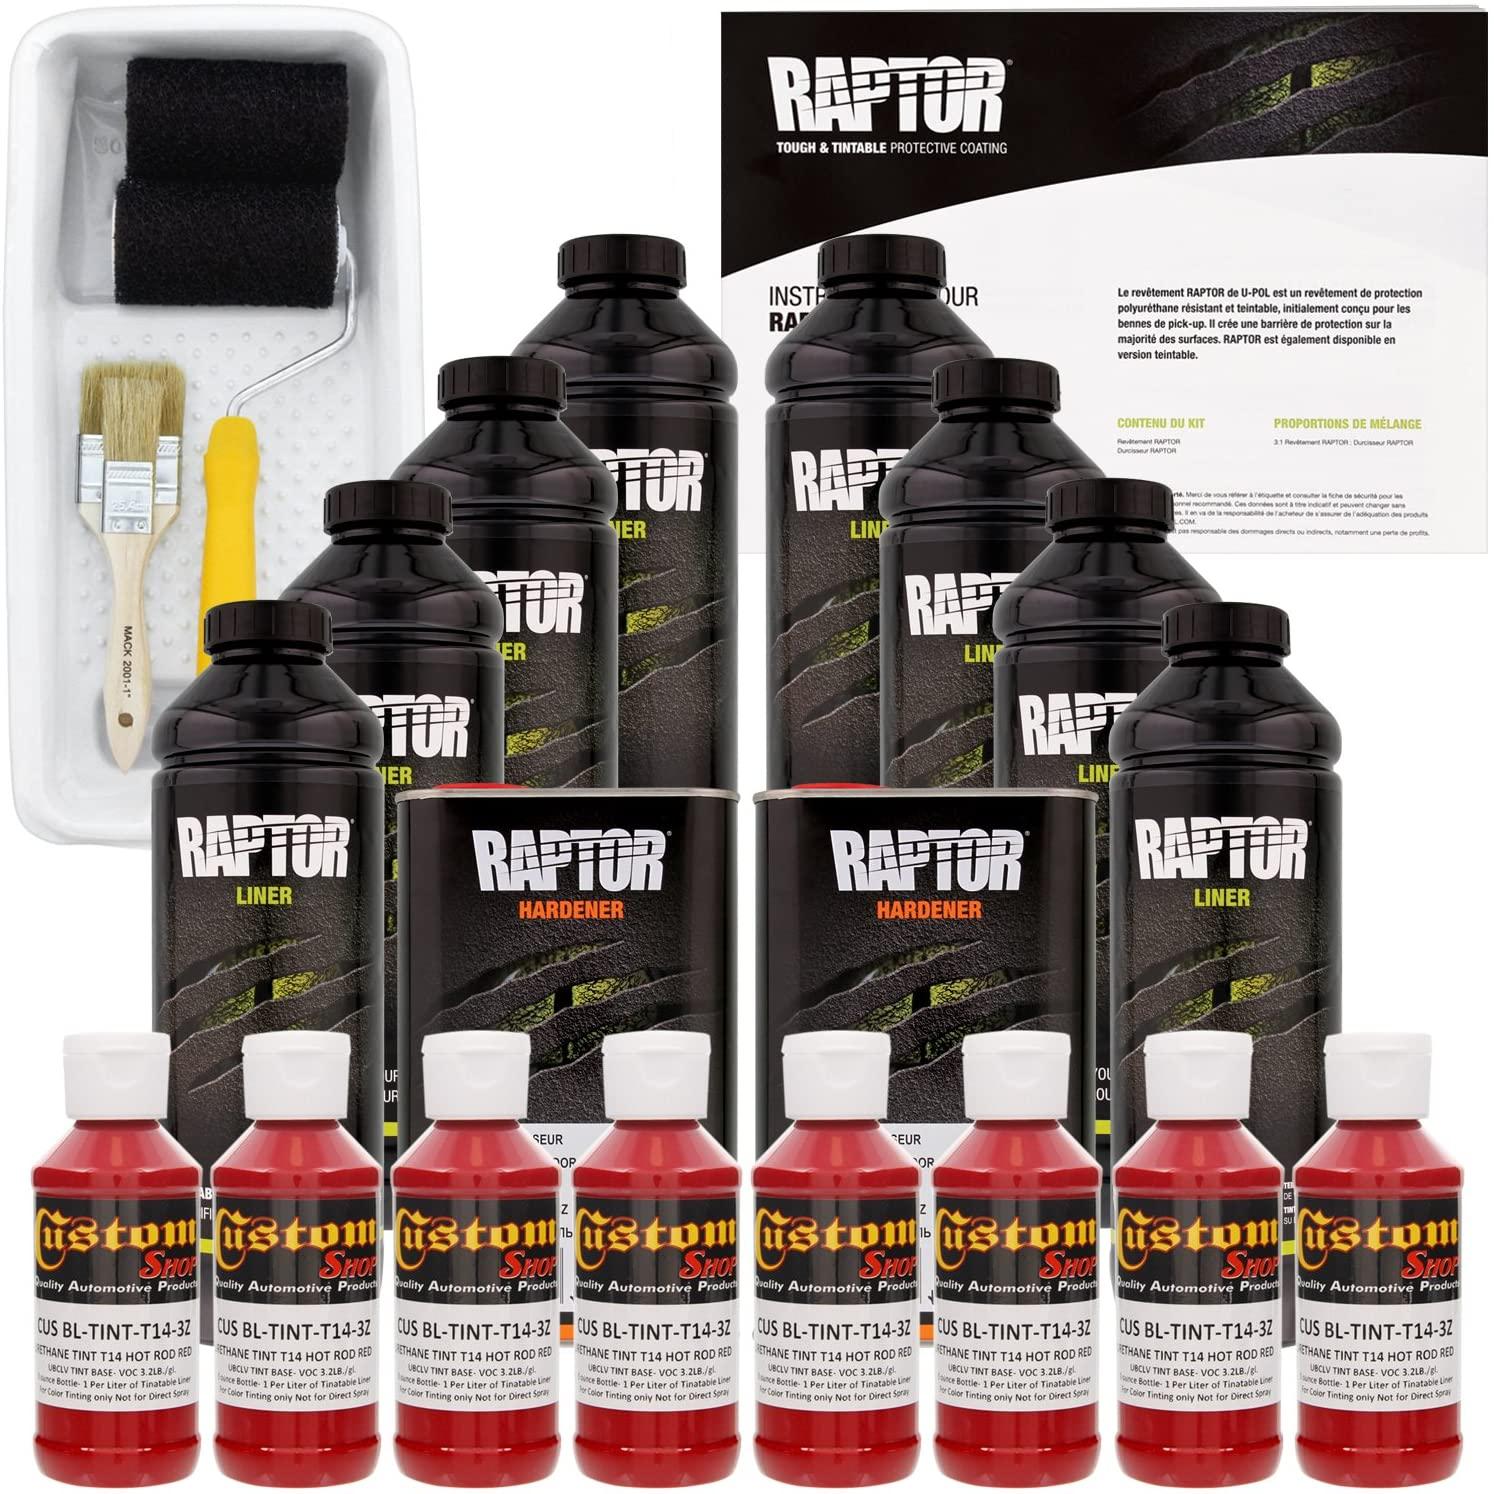 U-POL Raptor Hot Rod Red Urethane Spray-On Truck Bed Liner Kit w/Free Roller, Tray & Brush, 8 Liters